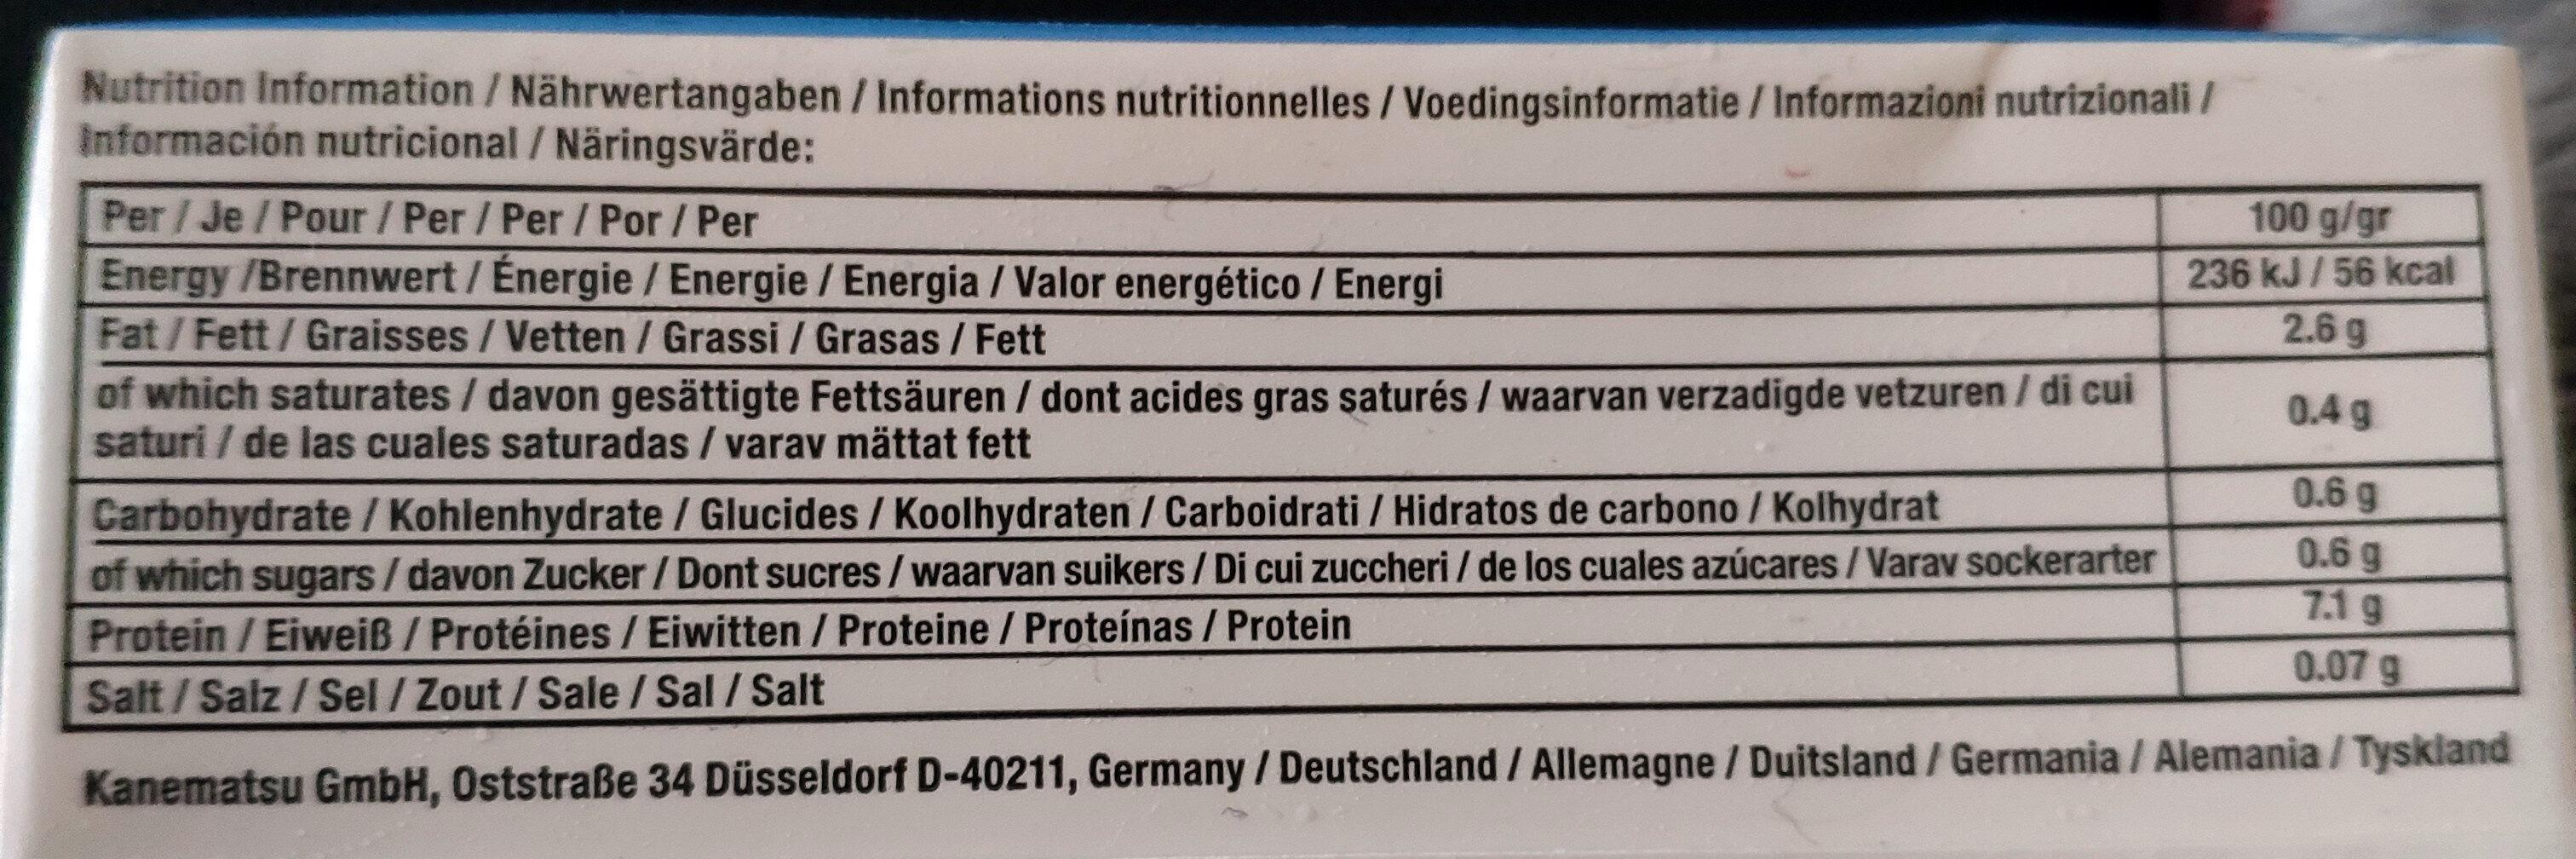 Morinu silken tofu firm - Valori nutrizionali - it